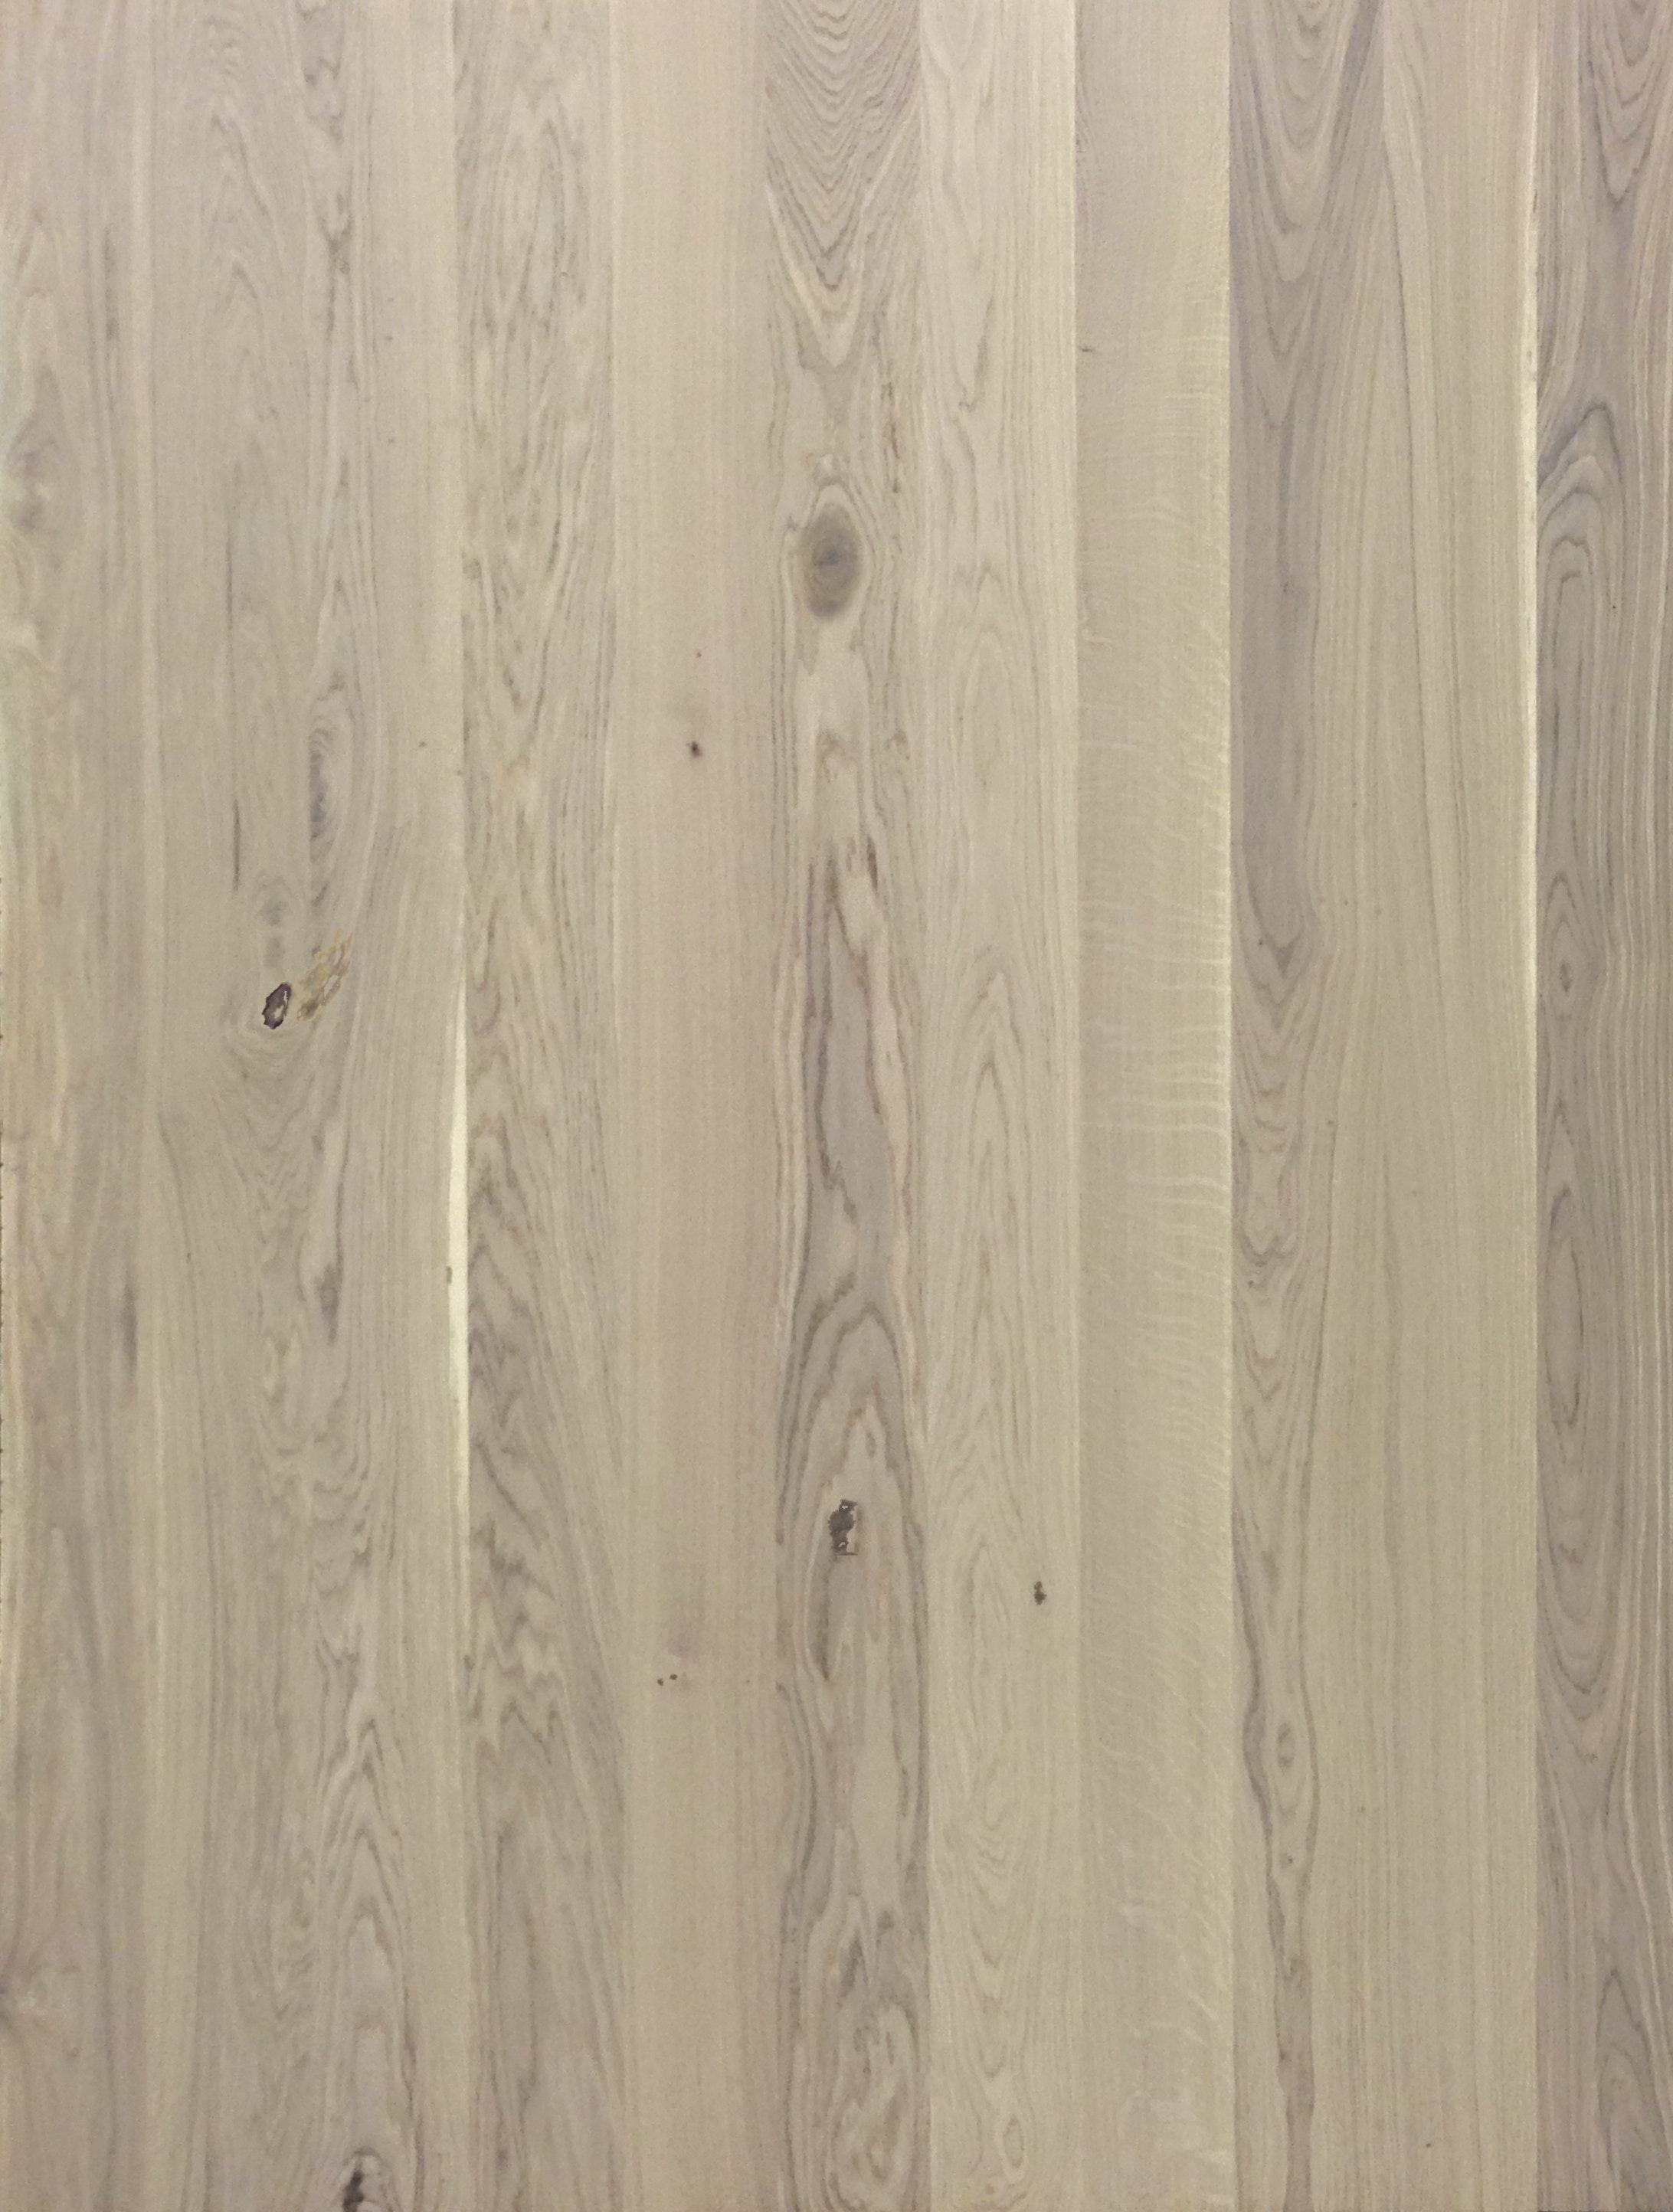 Parkettgolv Cello Frosty Wood Ek 1-Stav Mattlack 5G 14mm 2,20m²